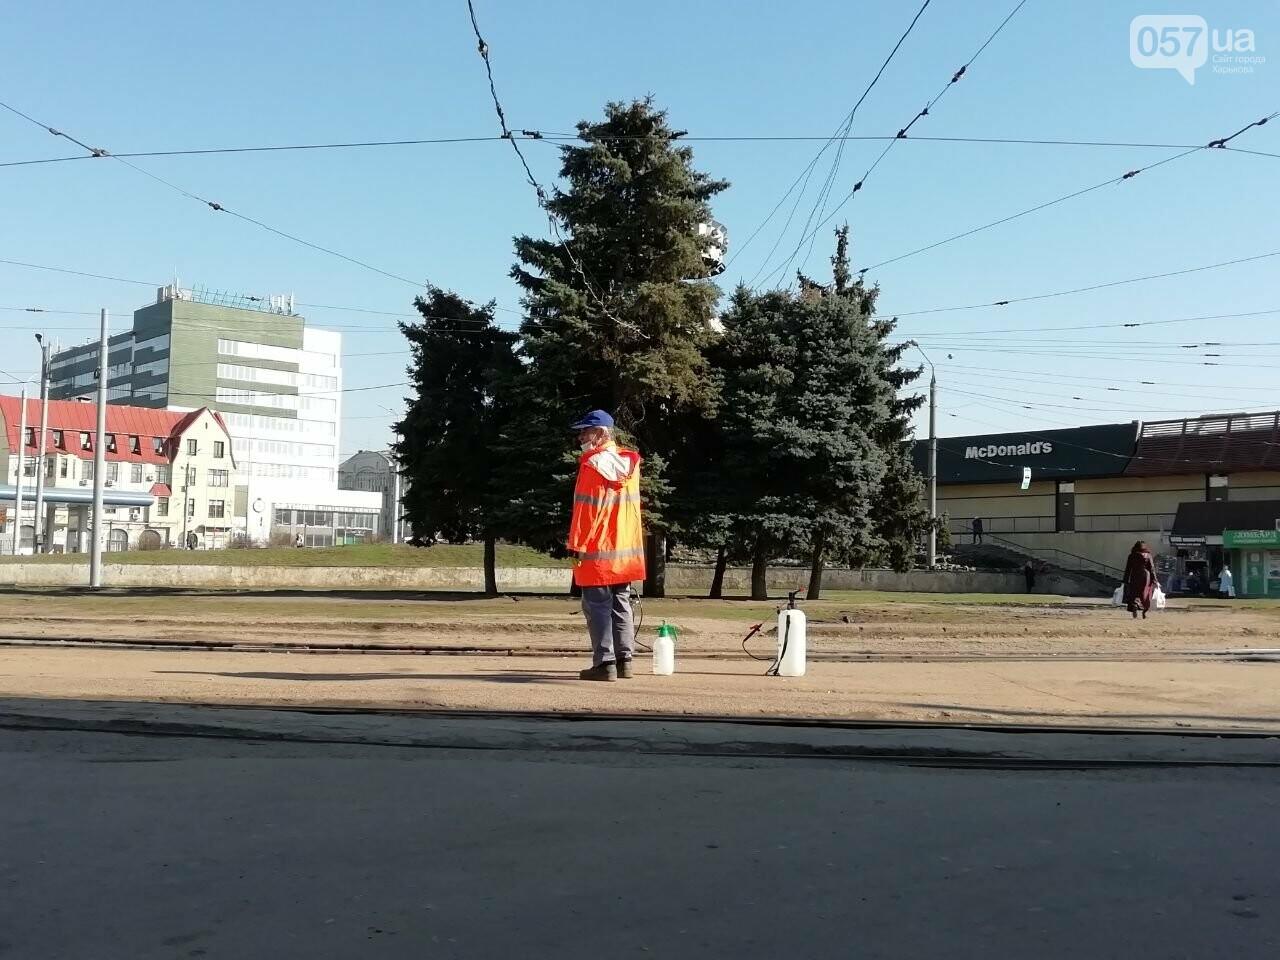 Безлюдный вокзал и дезинфекция трамваев: как живет ЮЖД во время карантина, - ФОТО, фото-17